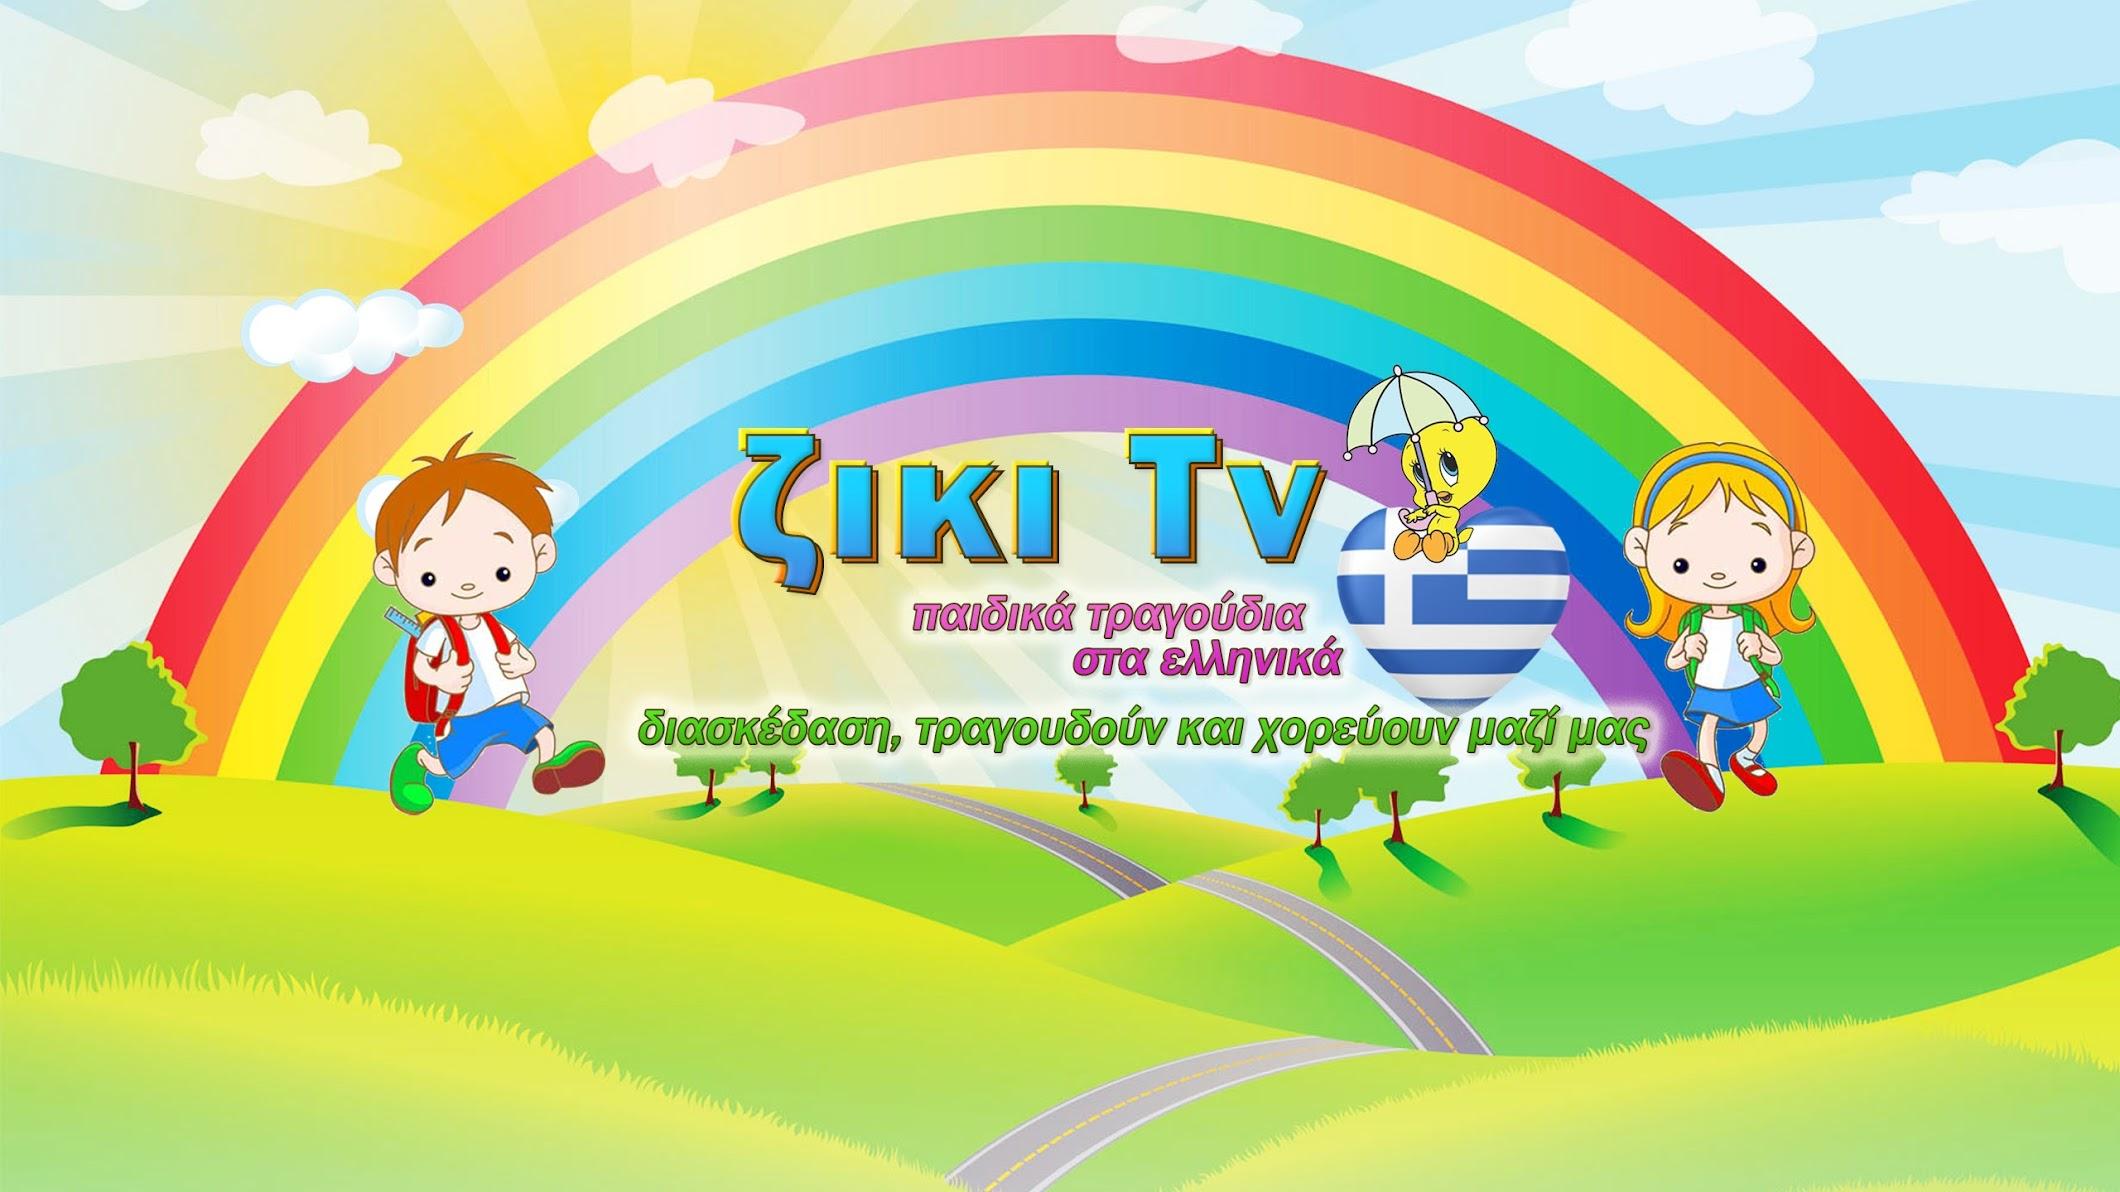 6cc9c84fc14 Ziki Tv παιδικά τραγούδια ελληνικά - Greek Nursery Rhymes - YouTube